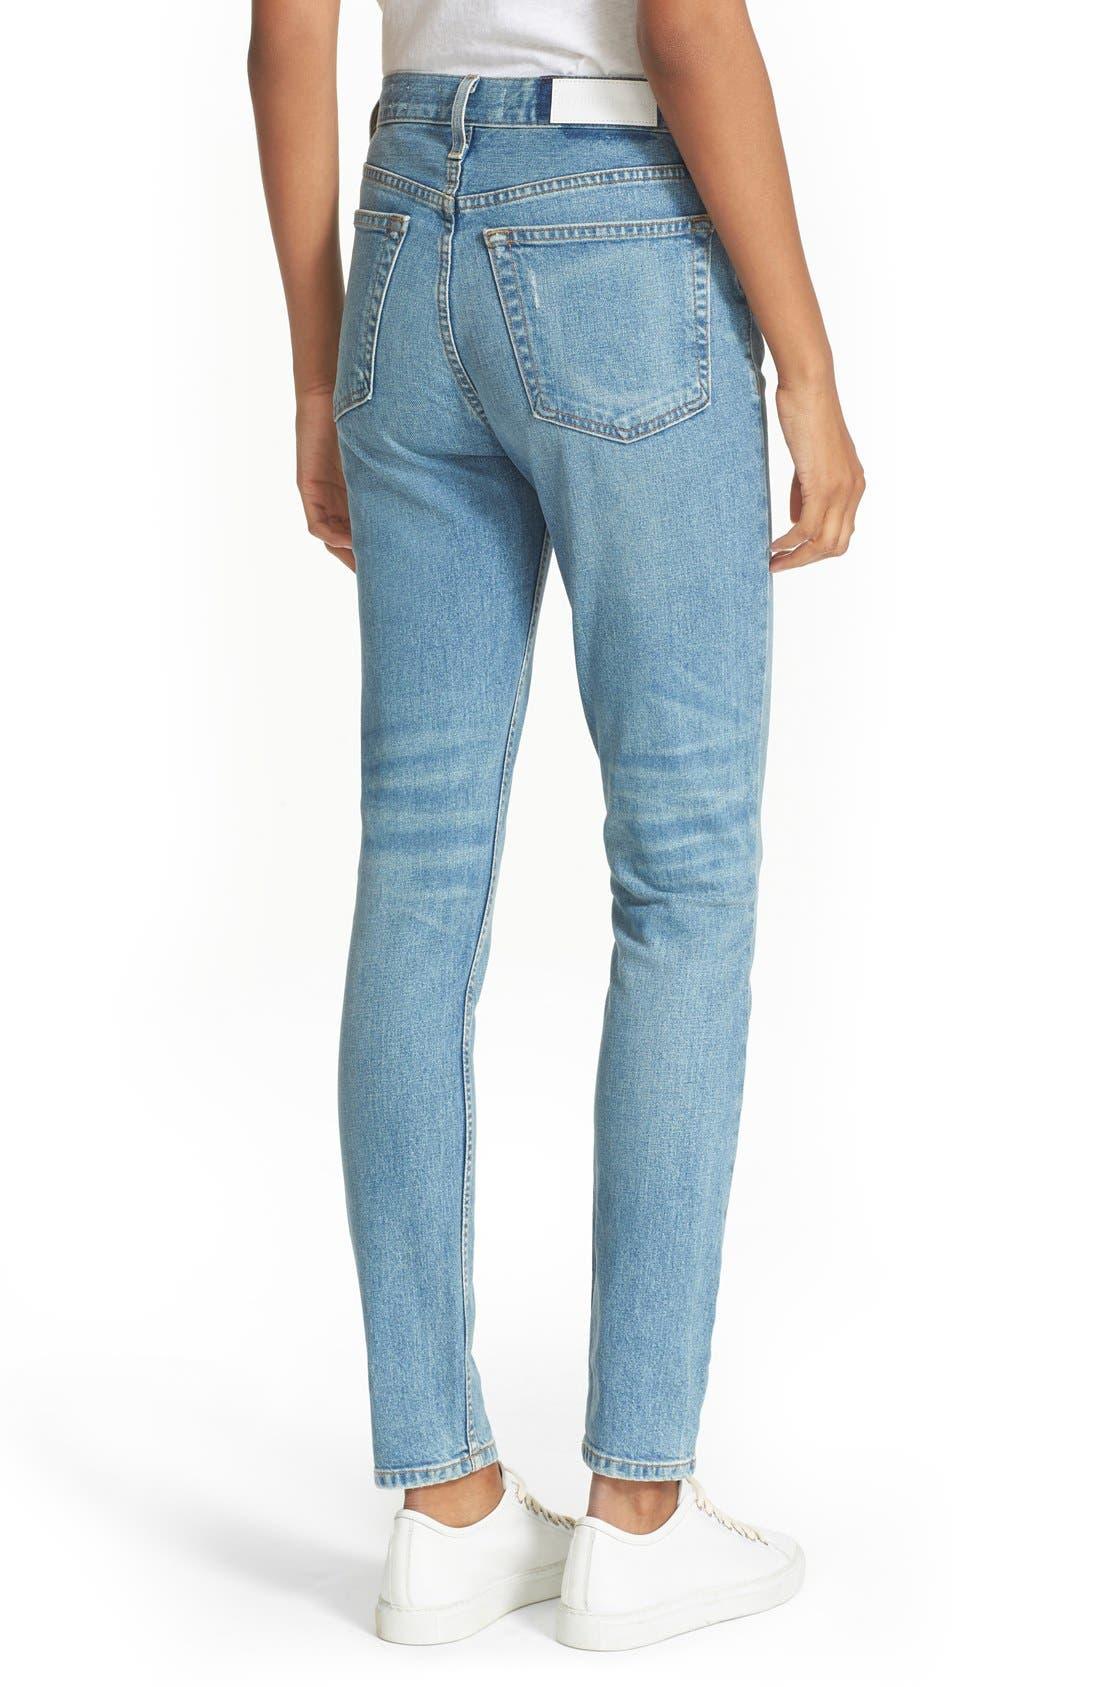 Originals High Rise Stretch Jeans,                             Alternate thumbnail 5, color,                             400